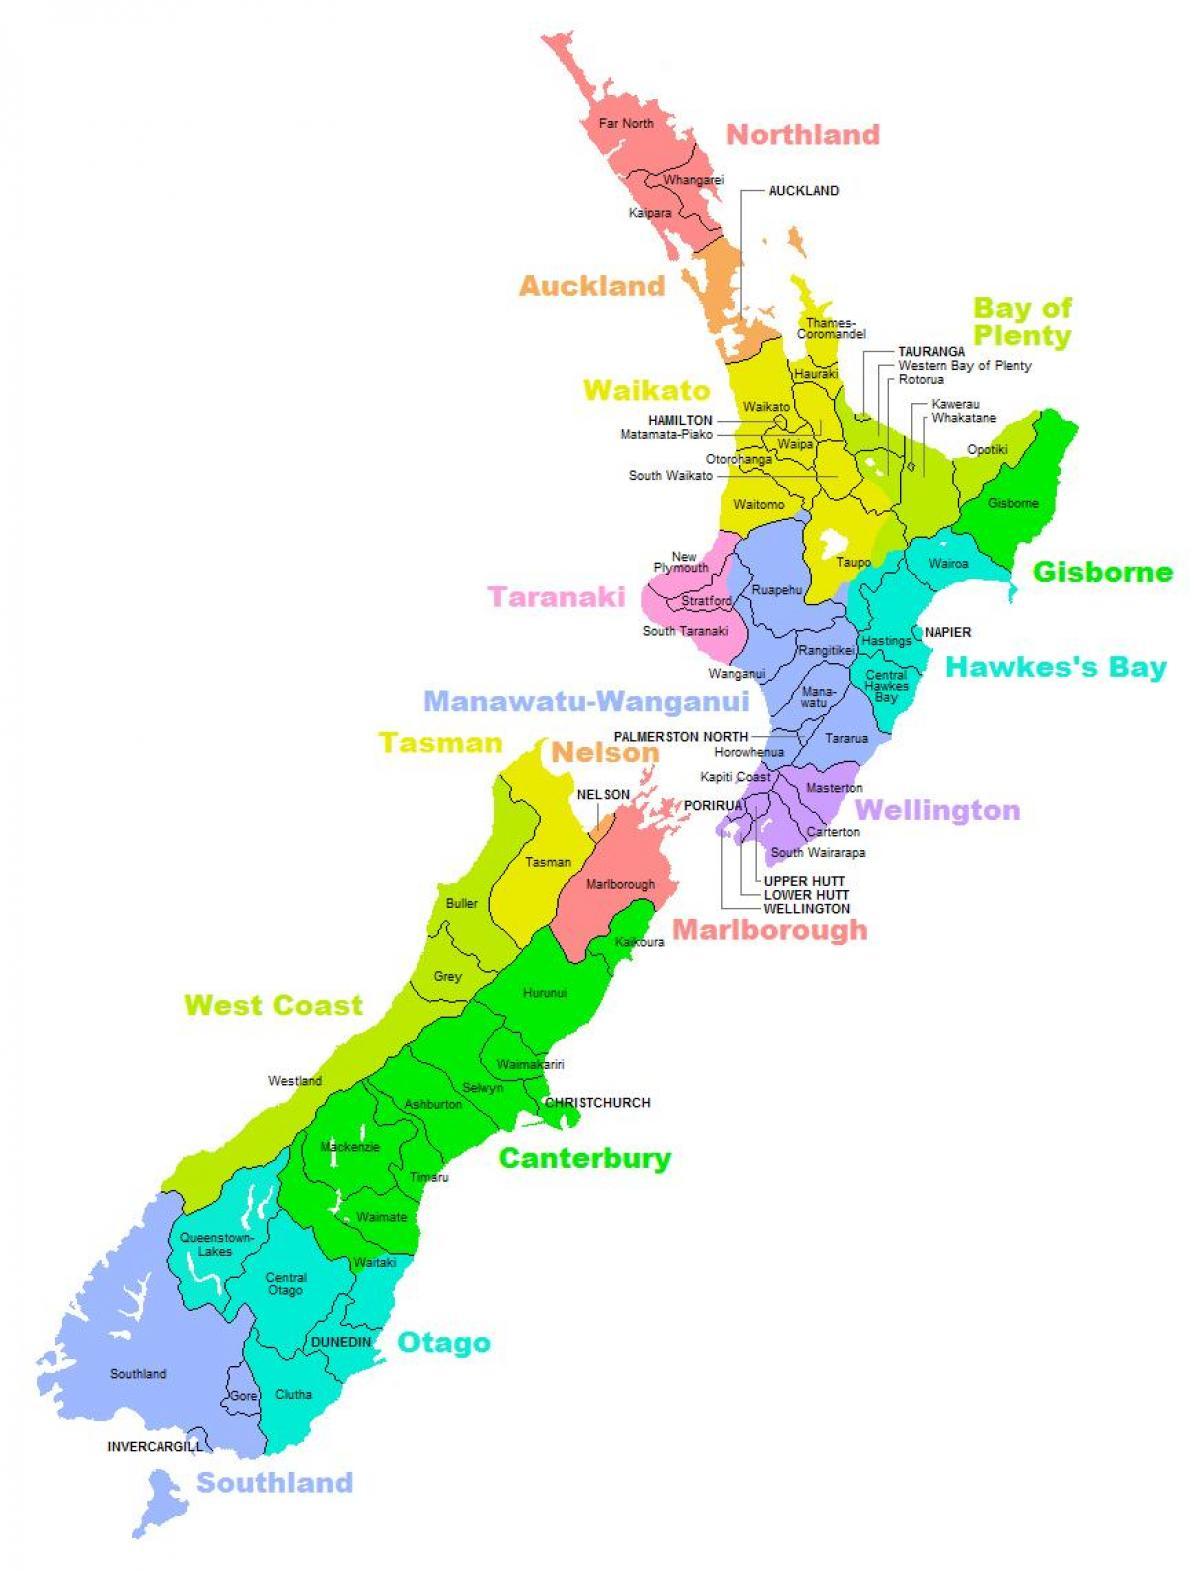 Cartina Nuova Zelanda.Nuova Zelanda Regioni Sulla Mappa Nuova Zelanda Distretto Mappa Australia E Nuova Zelanda Oceania